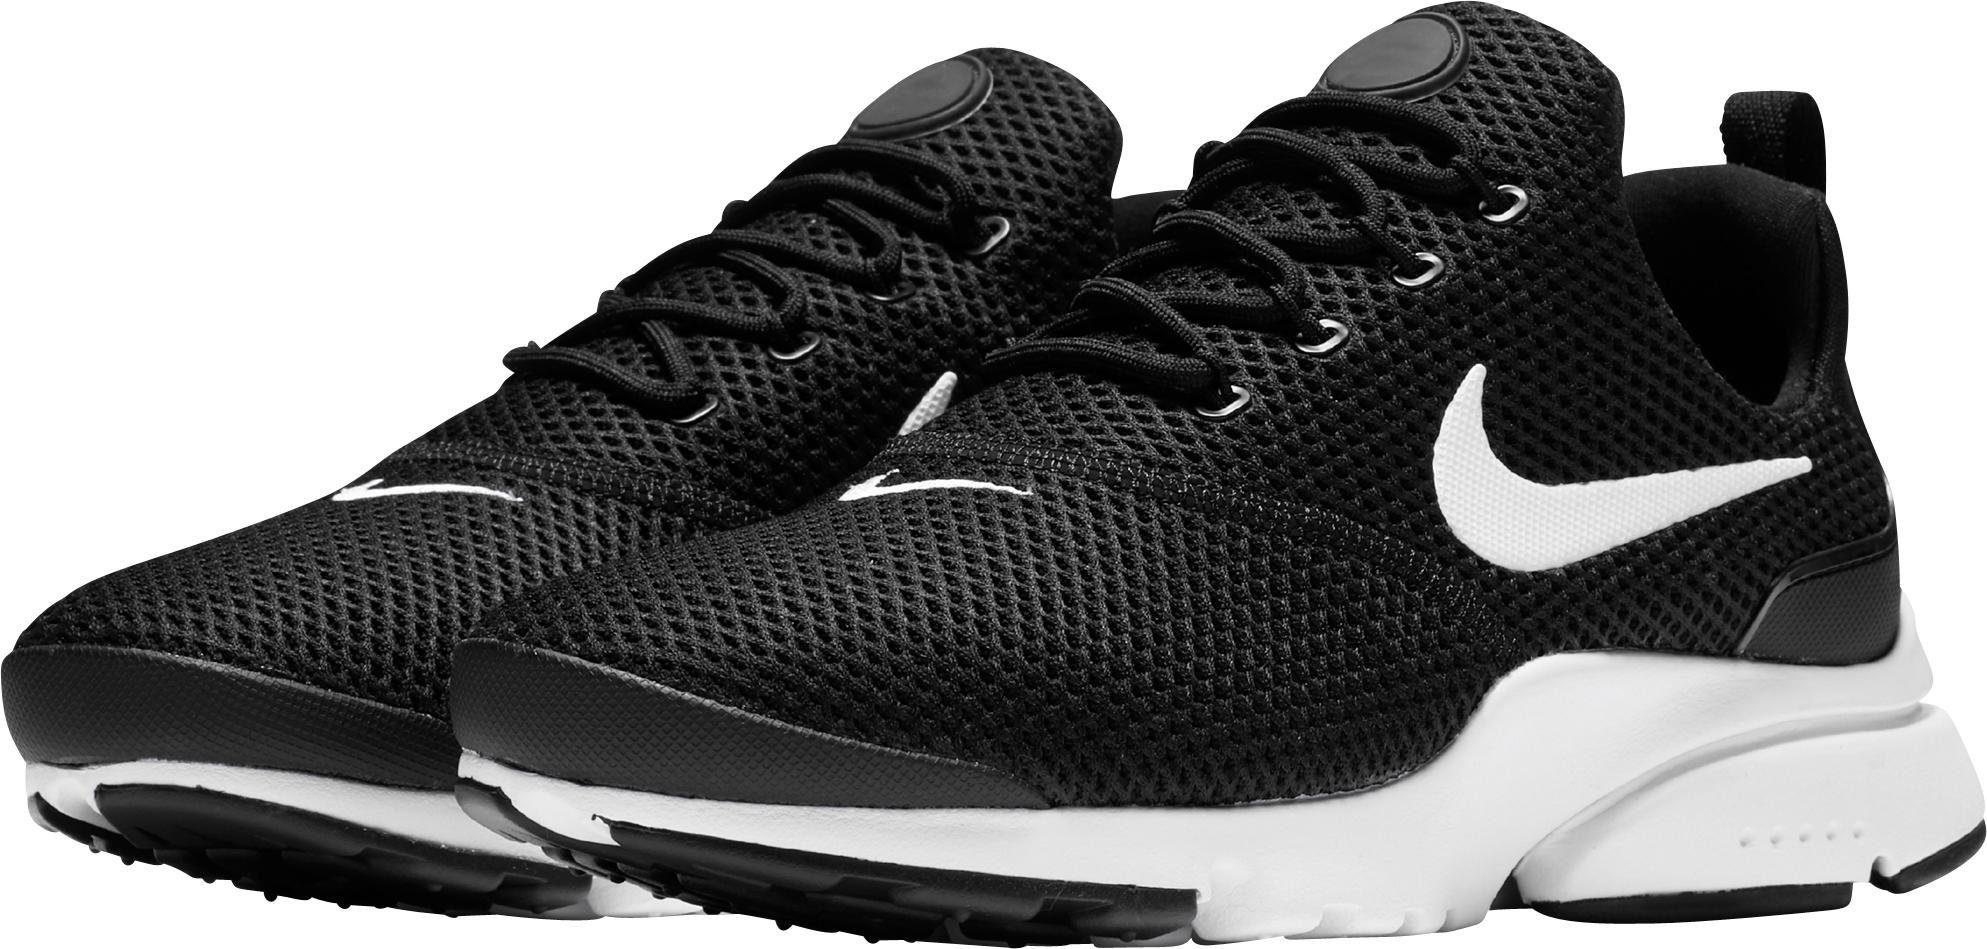 »wmns Fly« Sneaker KaufenOtto Sportswear Nike Presto yw0Nvm8nO